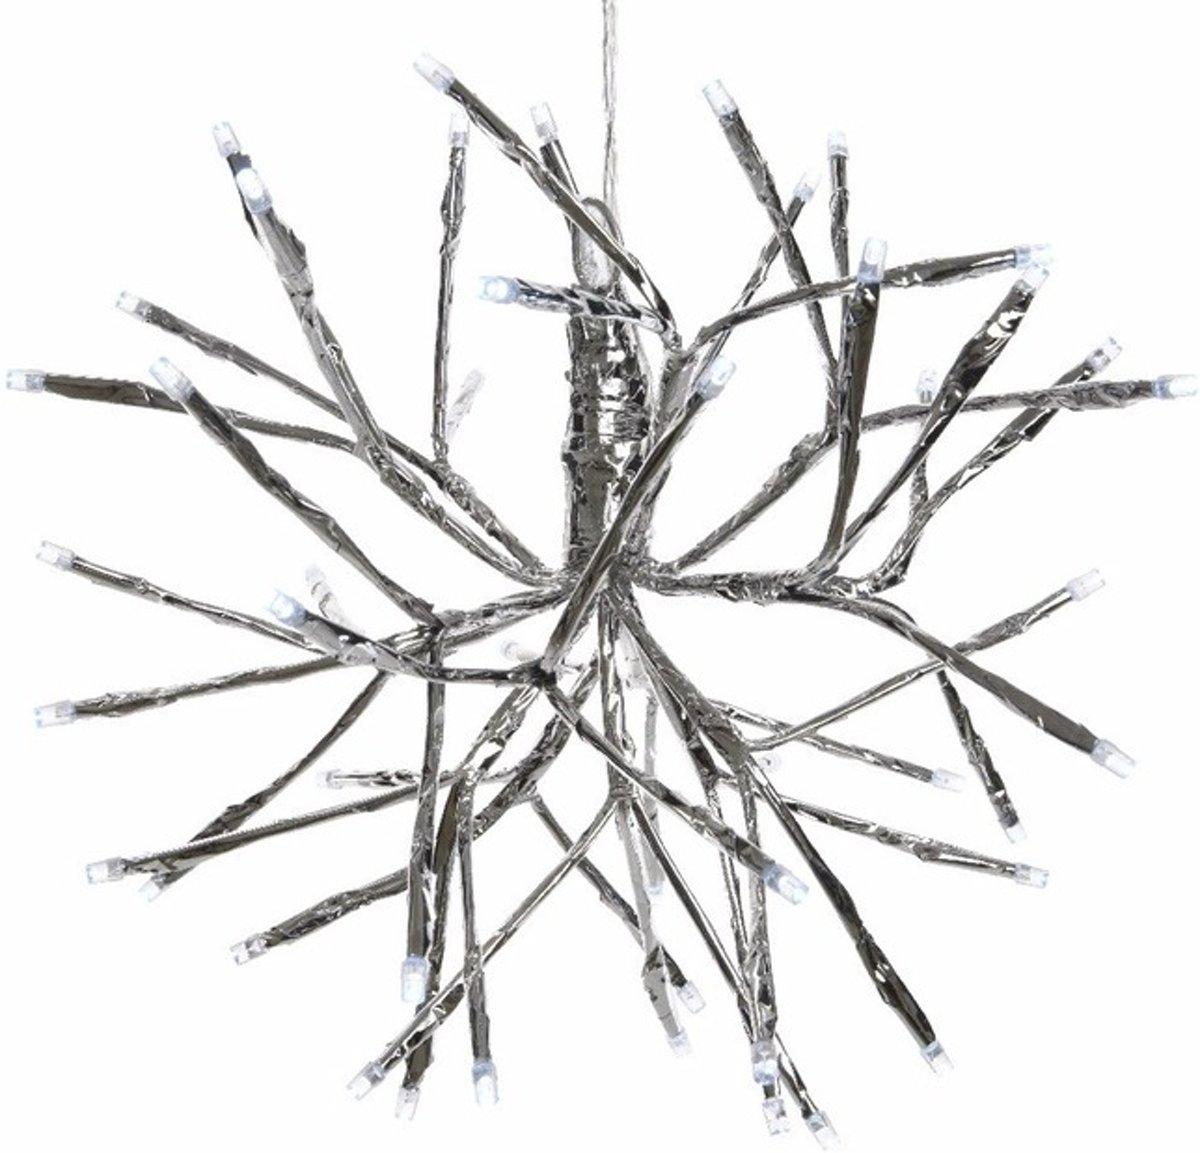 Kerstverlichting LED takkenbol koel wit binnen/buiten 25 cm kopen